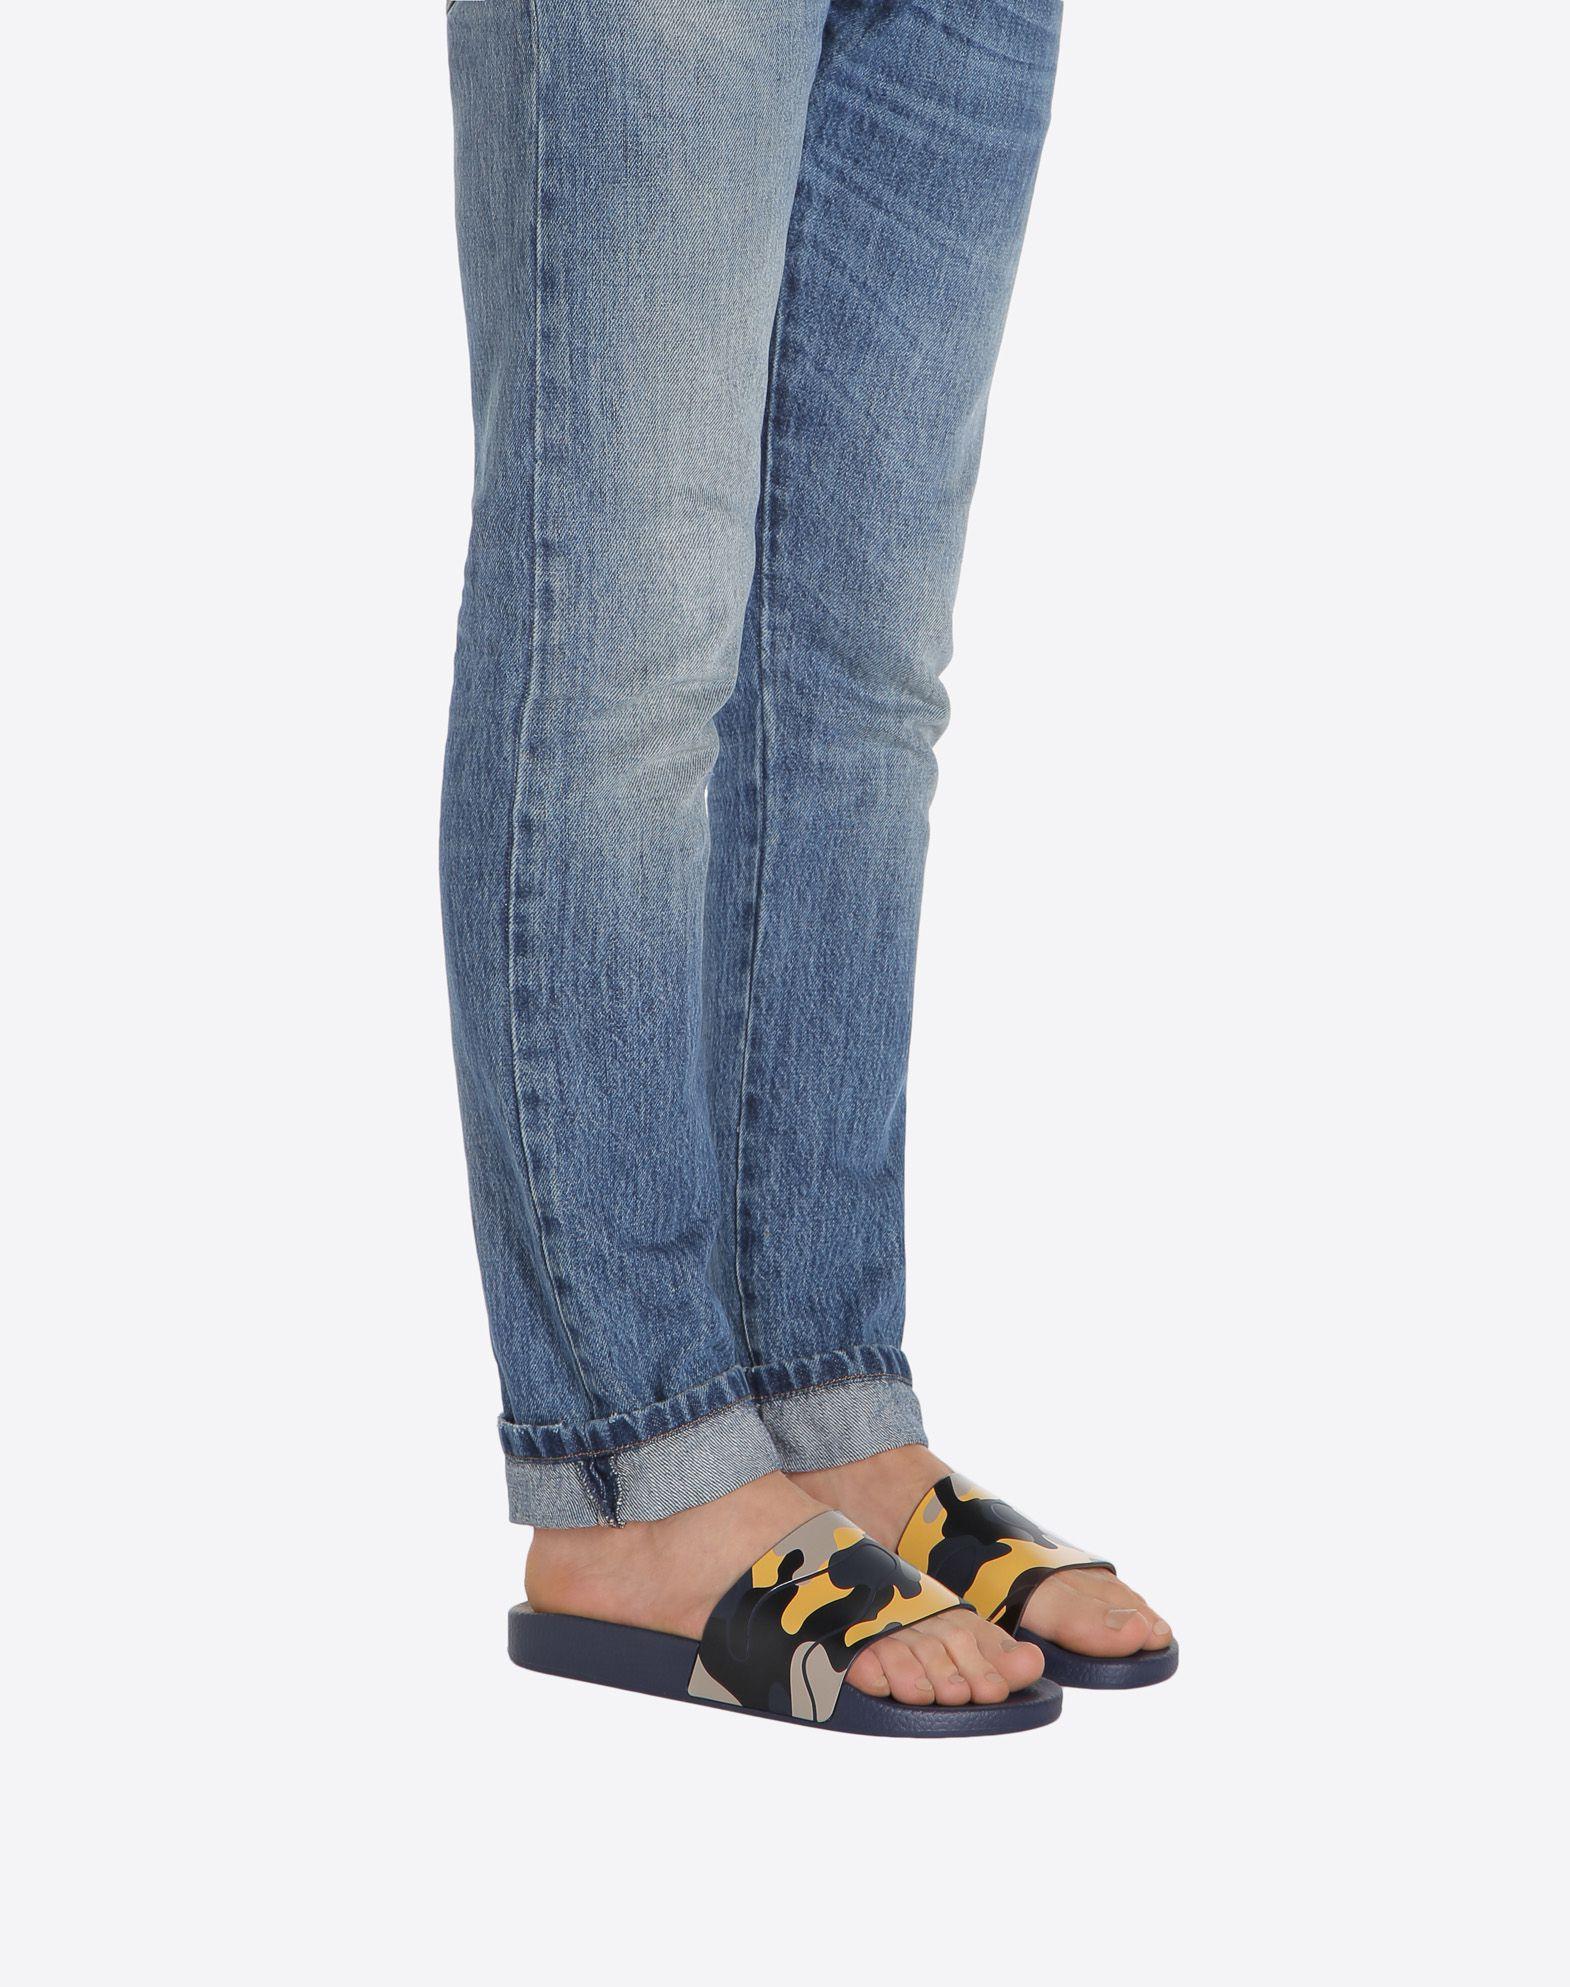 VALENTINO GARAVANI UOMO Camouflage 拖鞋式凉鞋 橡胶拖鞋式凉鞋 U a